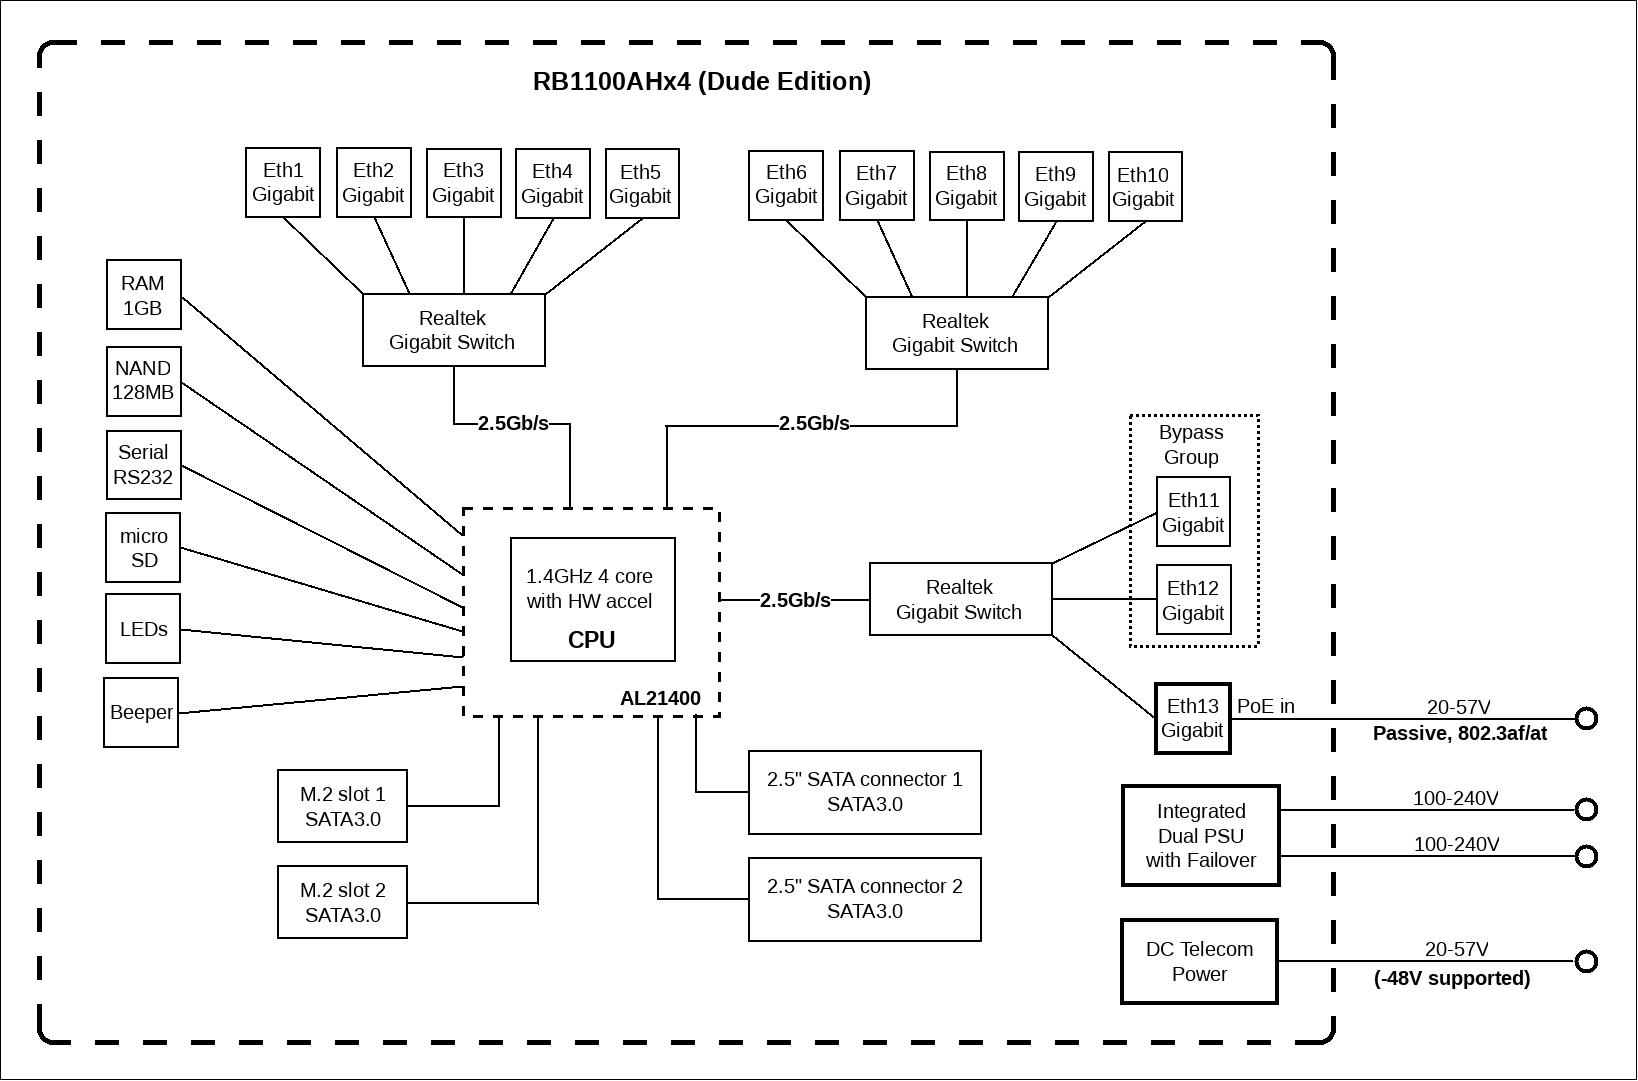 блок-диаграмма mikrotik routerboard 1100AHx4 Dude Edition